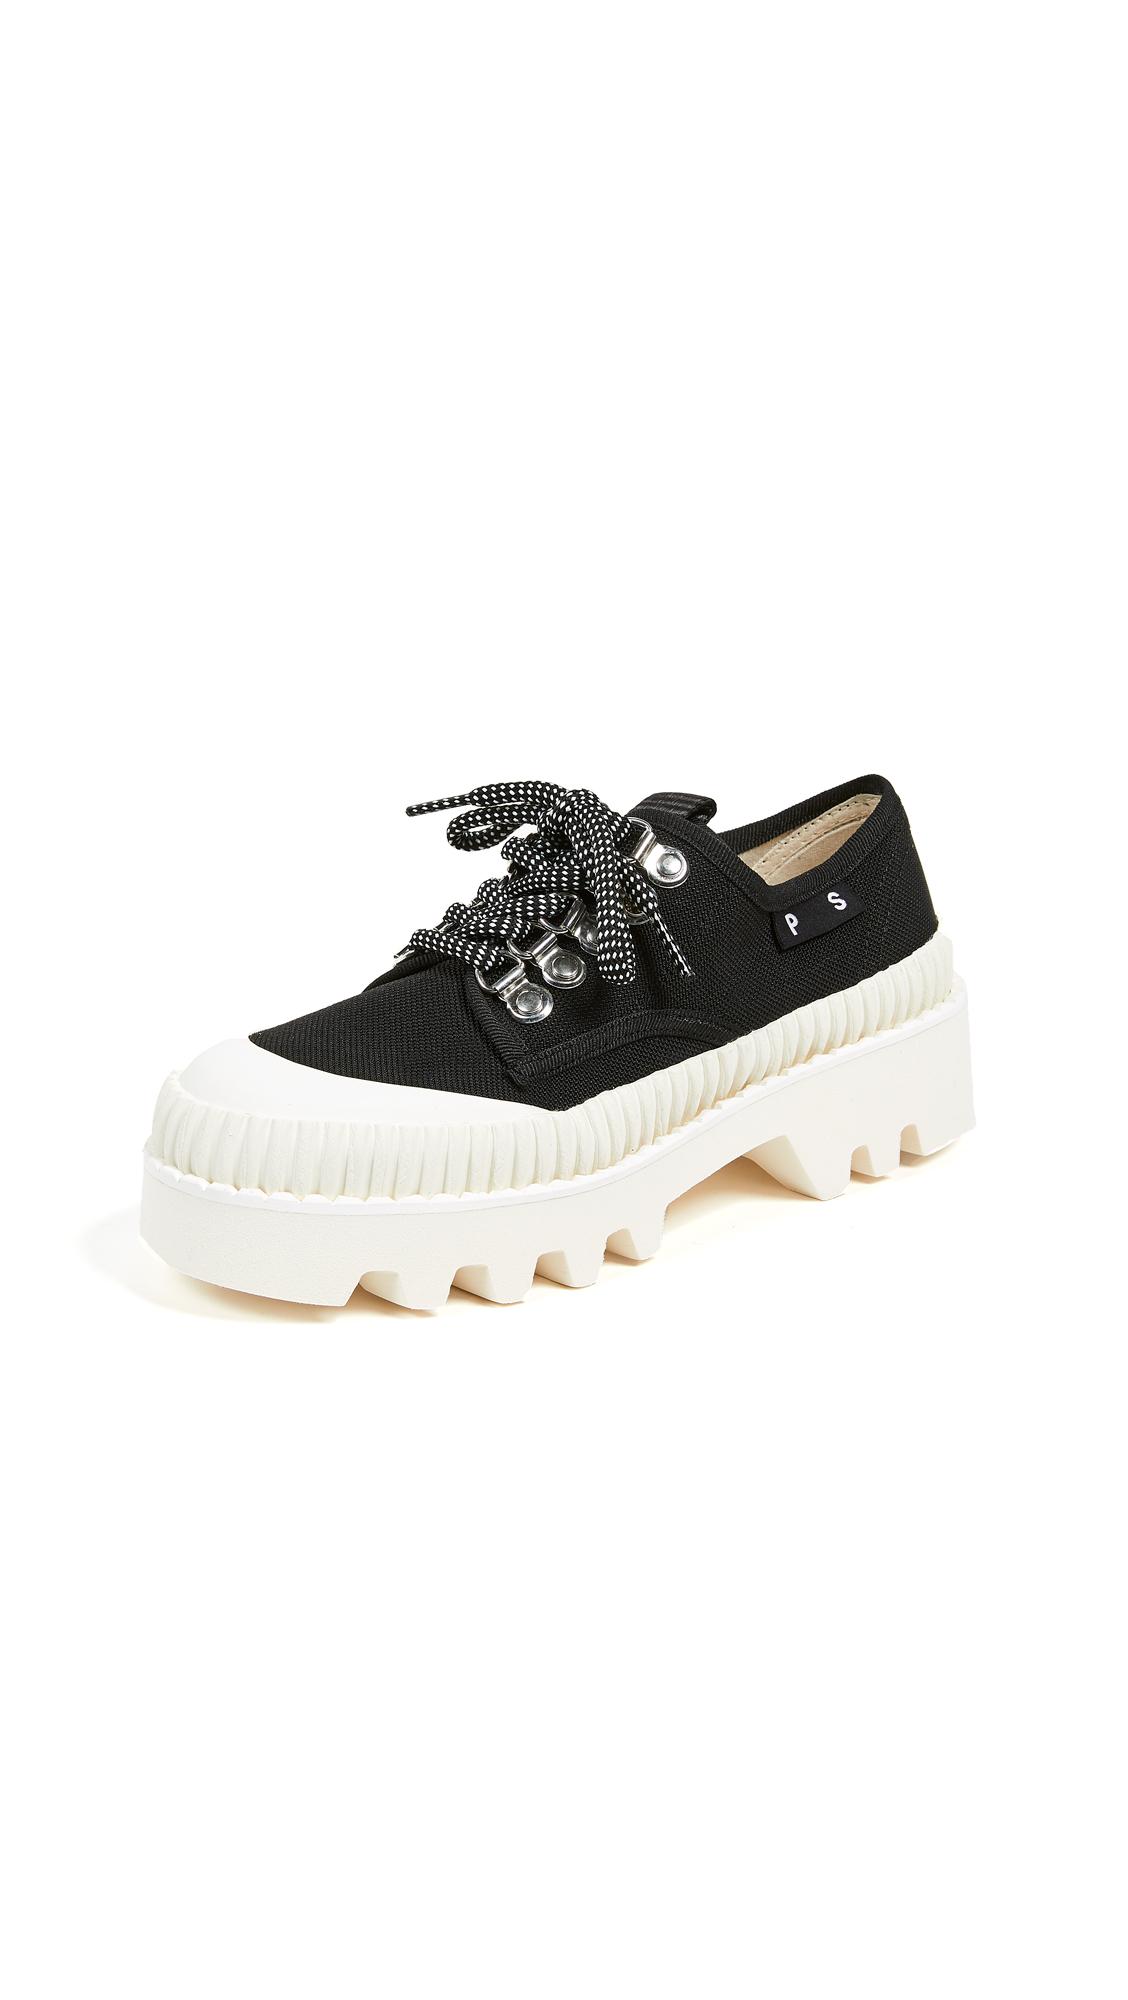 Proenza Schouler Platform Sneakers - Black/White